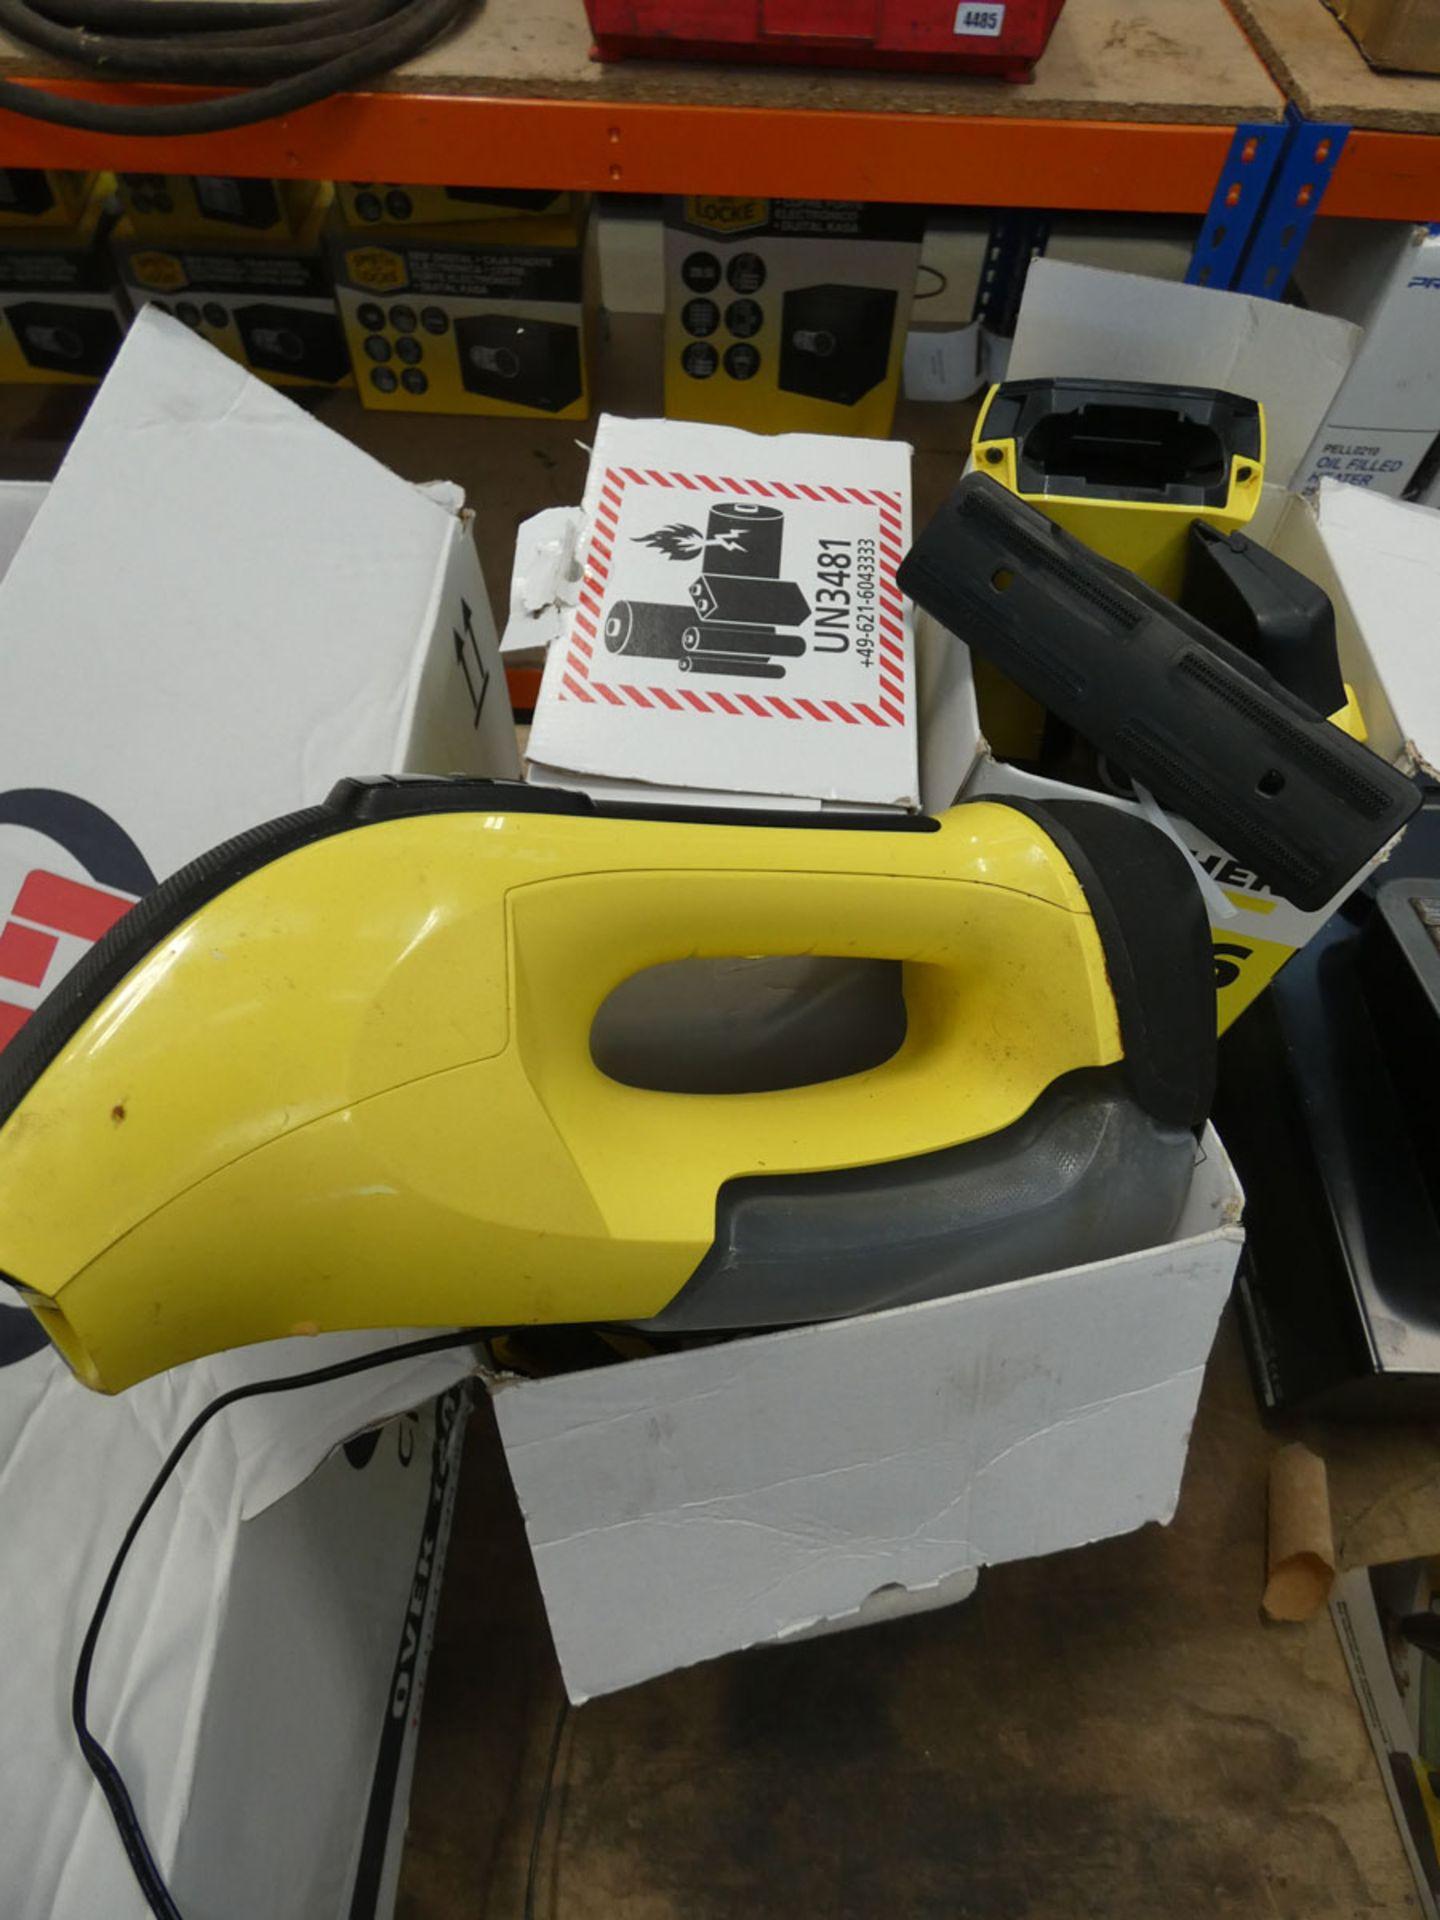 4754 - 3 Karcher window vacuums - Image 2 of 2